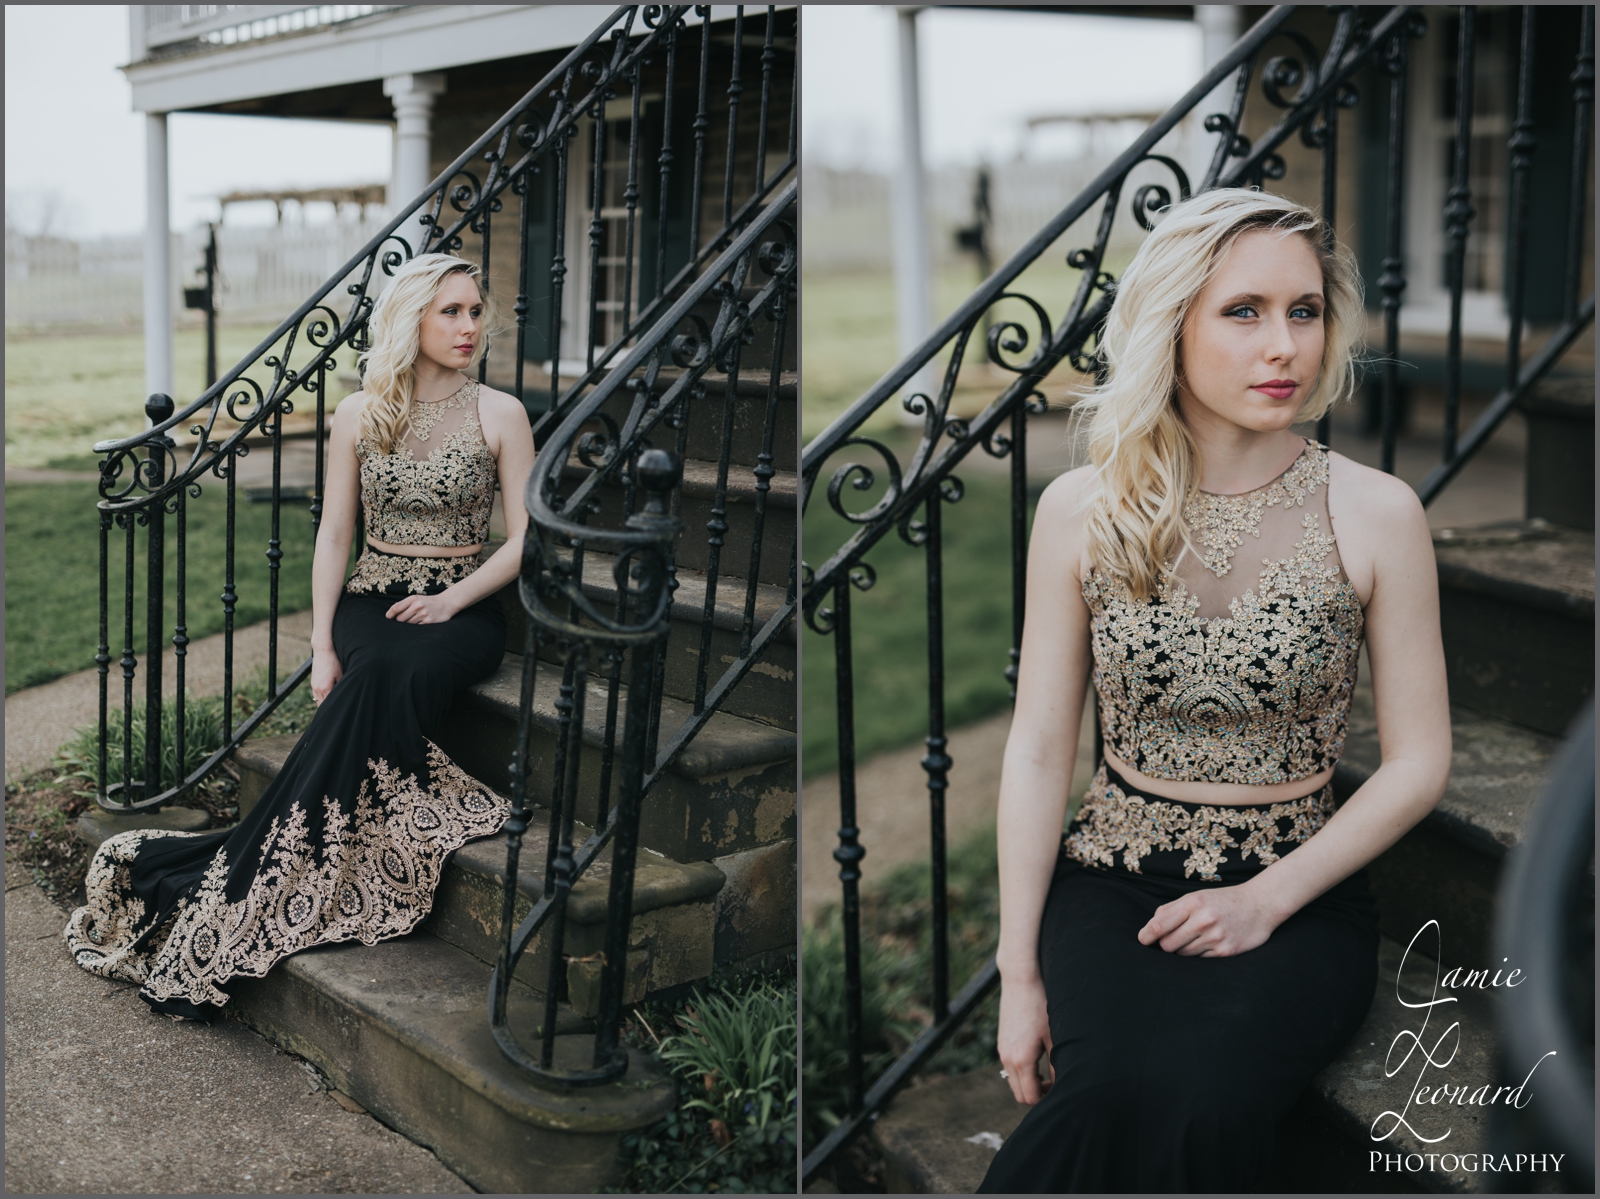 jamie_leonard_photography_prom_dress_best_photographer_latrobe_greensburg_mount_pleasant.jpg